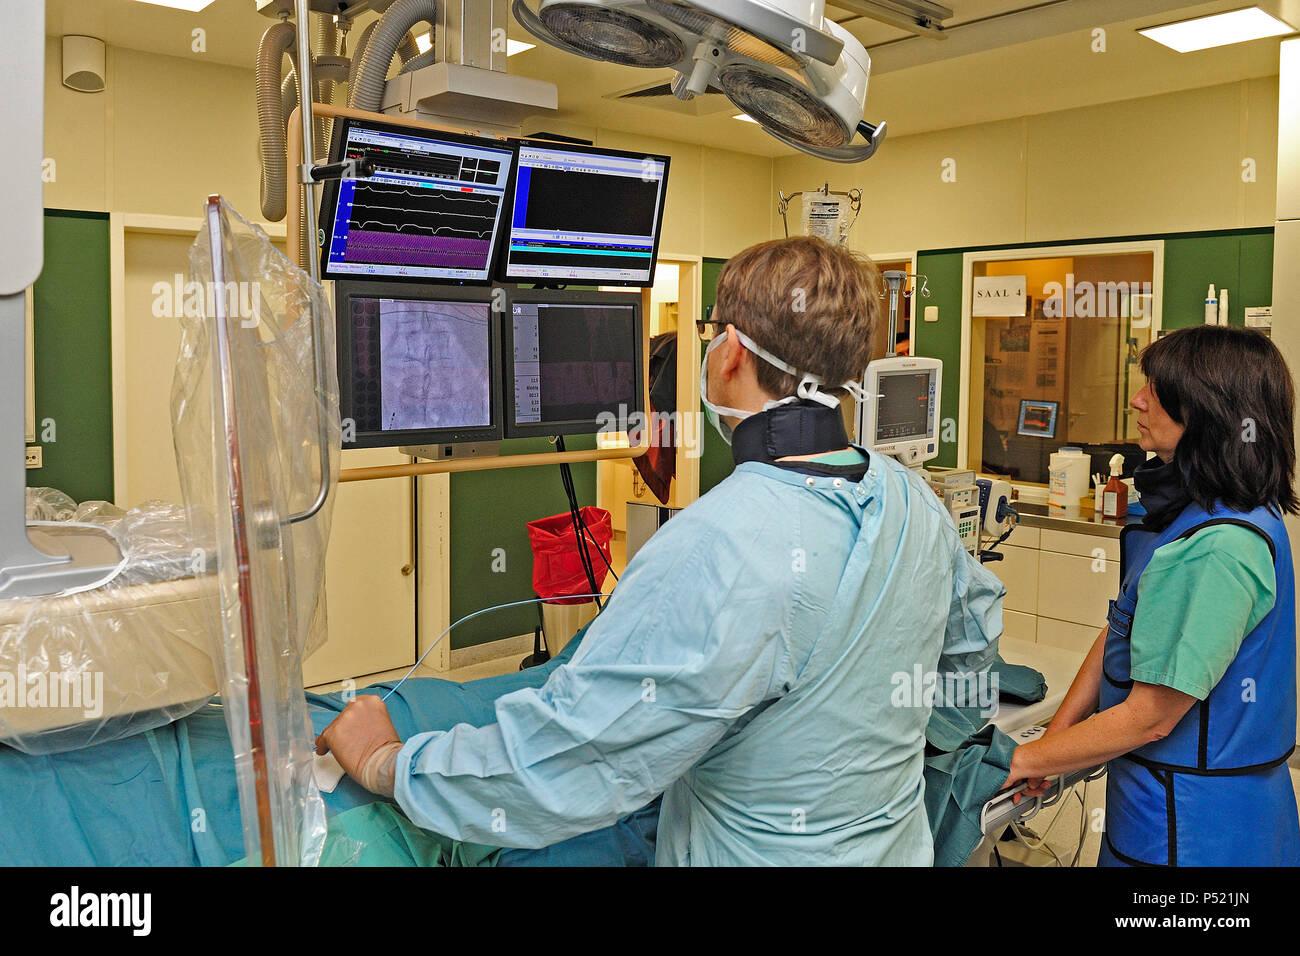 Germany, North Rhine-Westphalia-Kliniken Bergmannsheil in Bochum - Stock Image